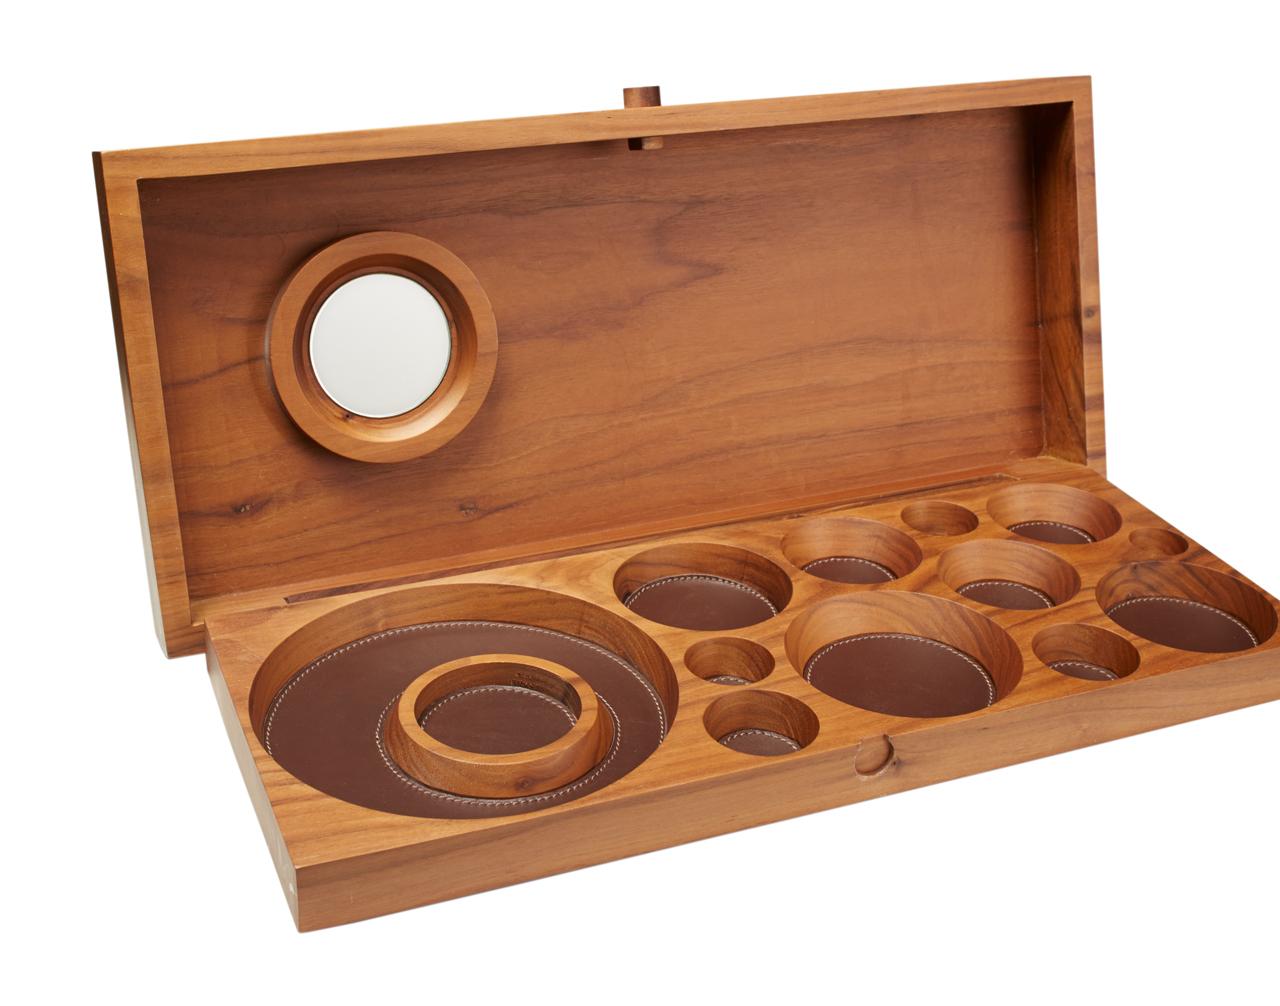 TRONKSandCo-Jewelry-Box-2-BRINDIS